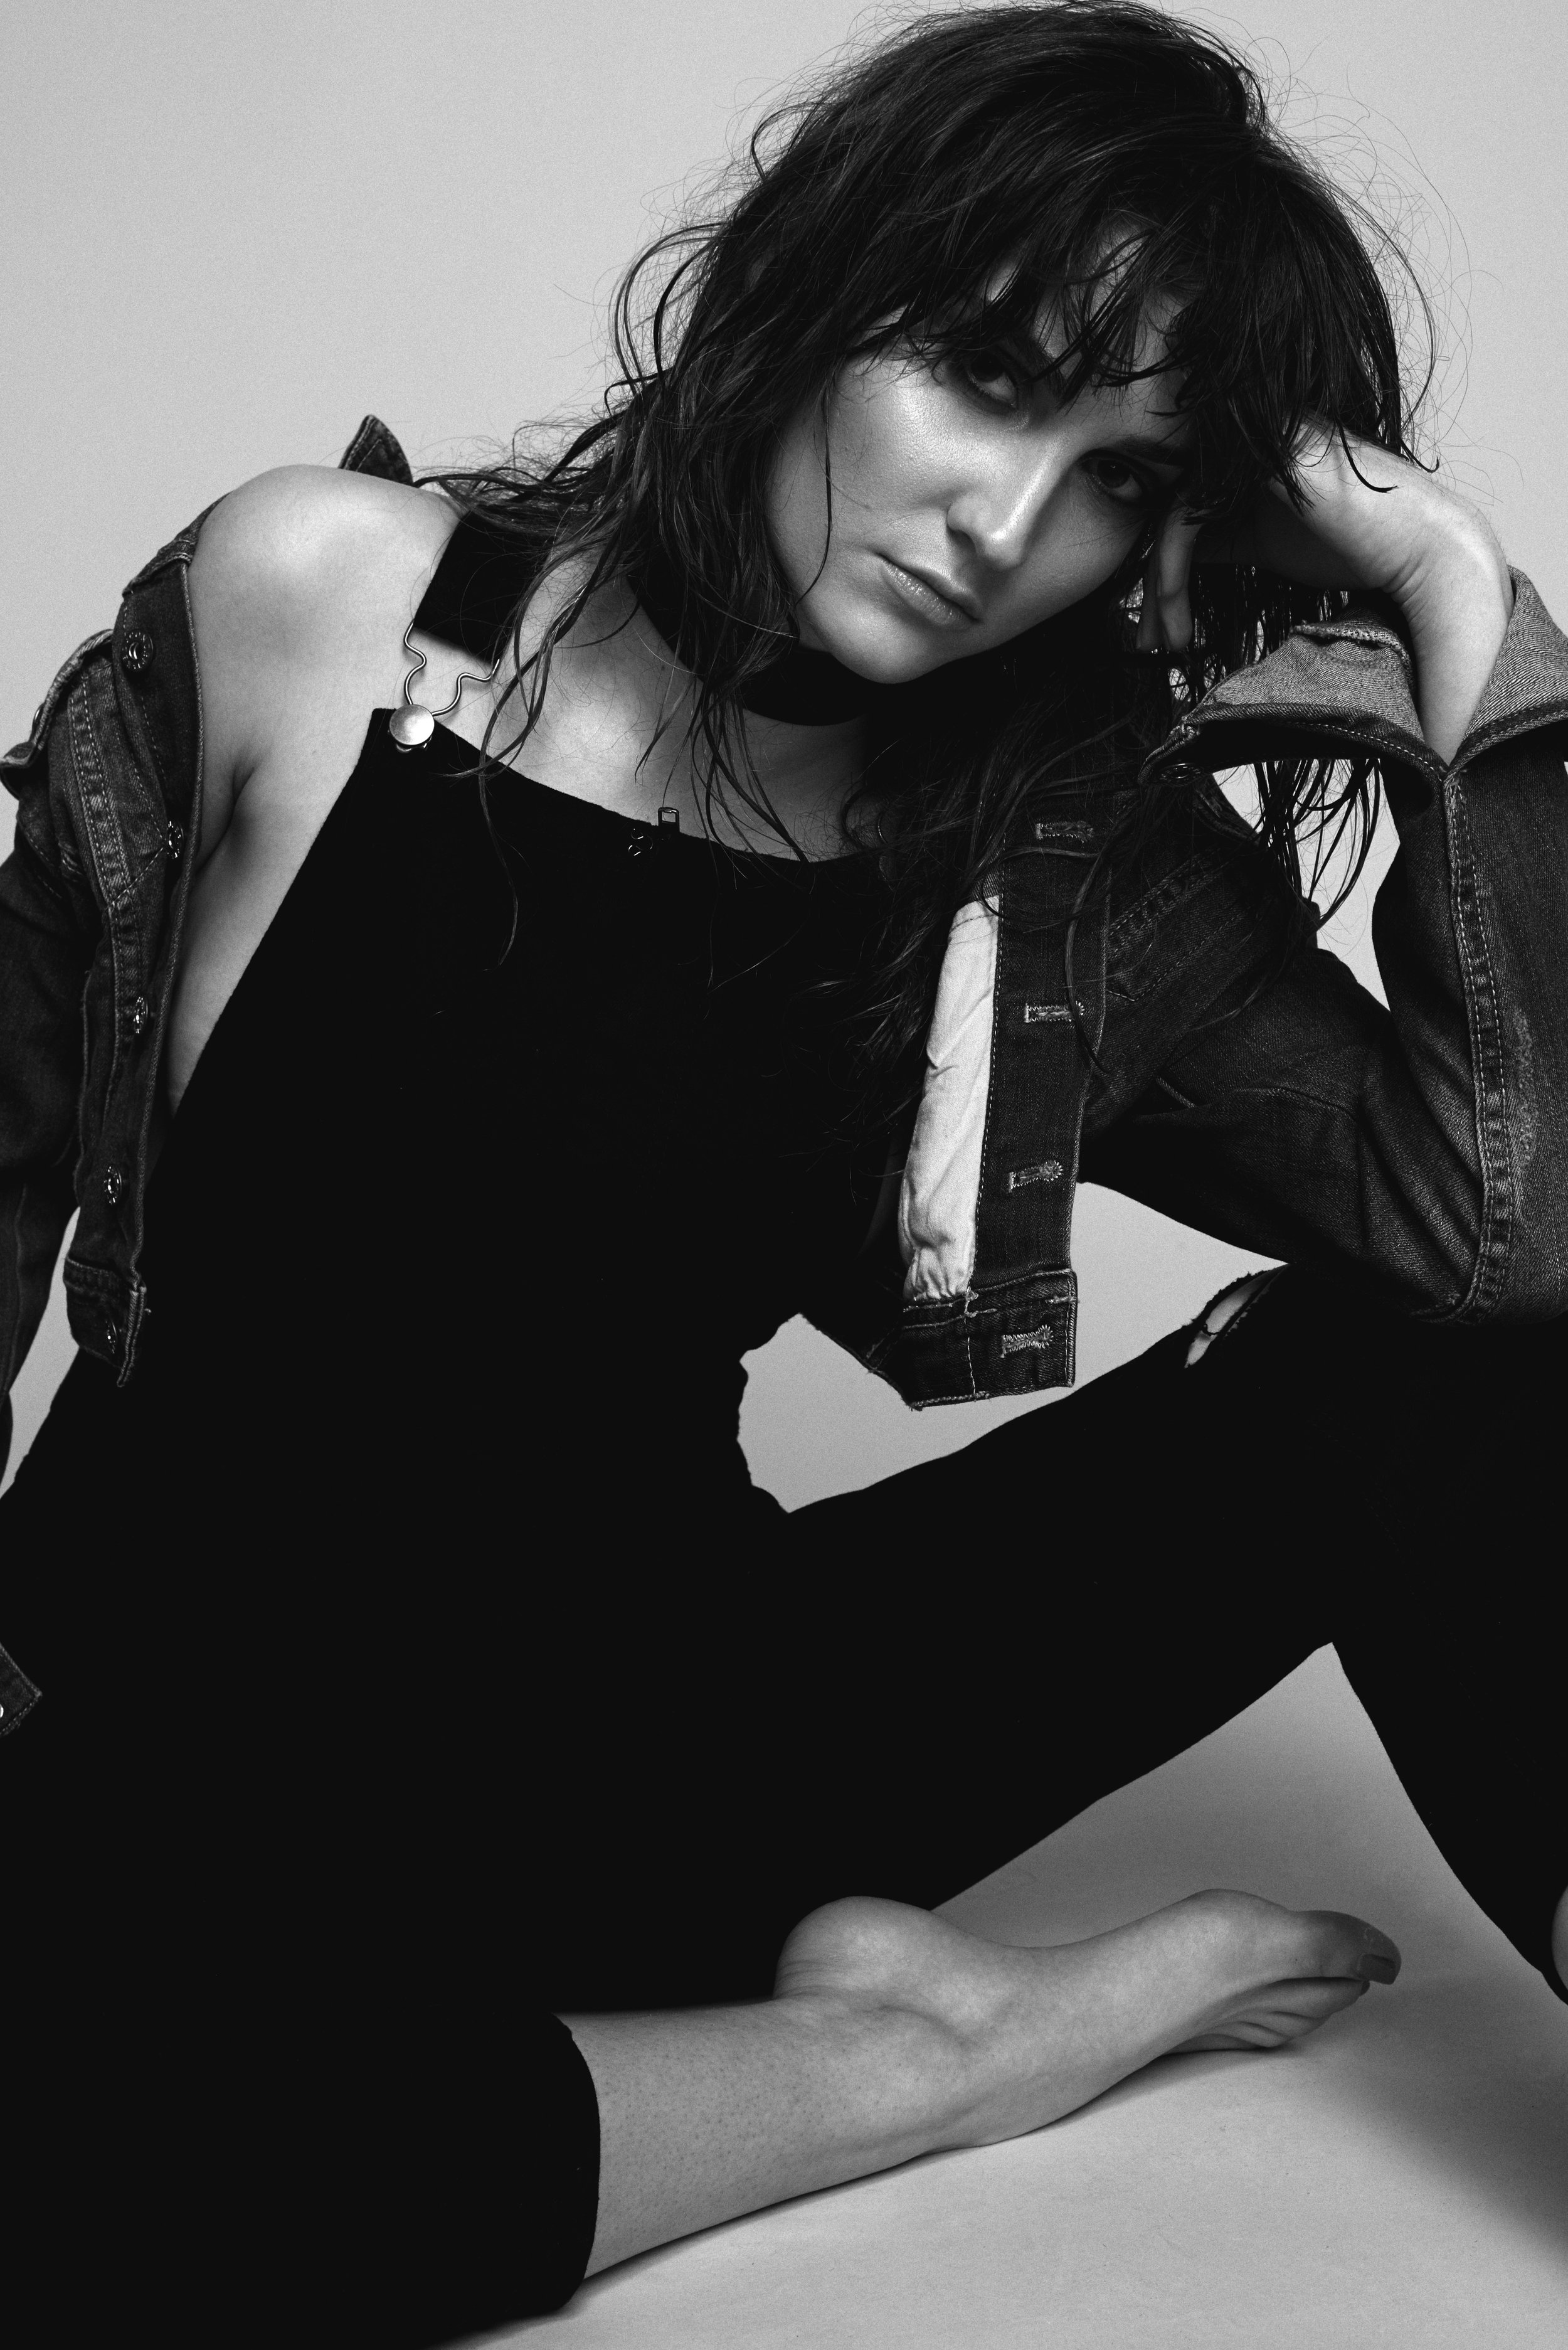 Model: Danae Digiulio @danaedigiulio   Photo: Justin Vaseur @justinvaseur   Mua: Briseida Rubio @brisi_rubio   Stylist: iliki @ilikithestylist